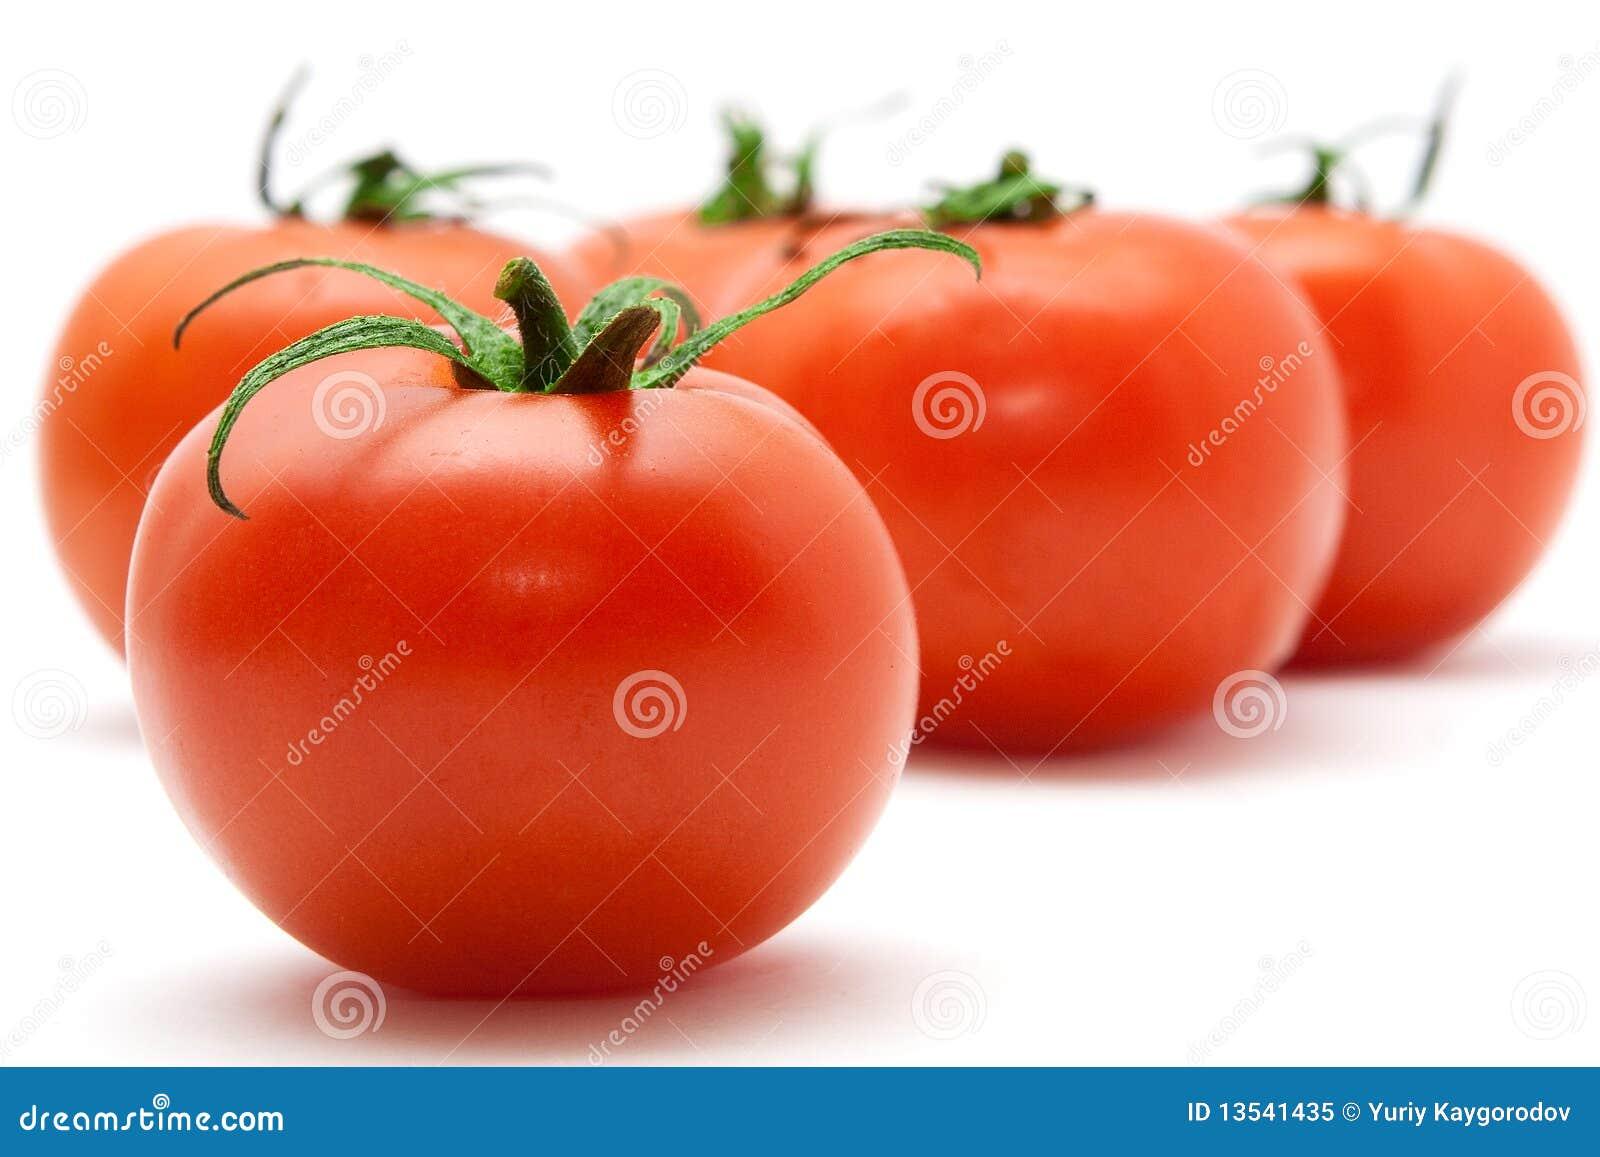 Insieme dei pomodori